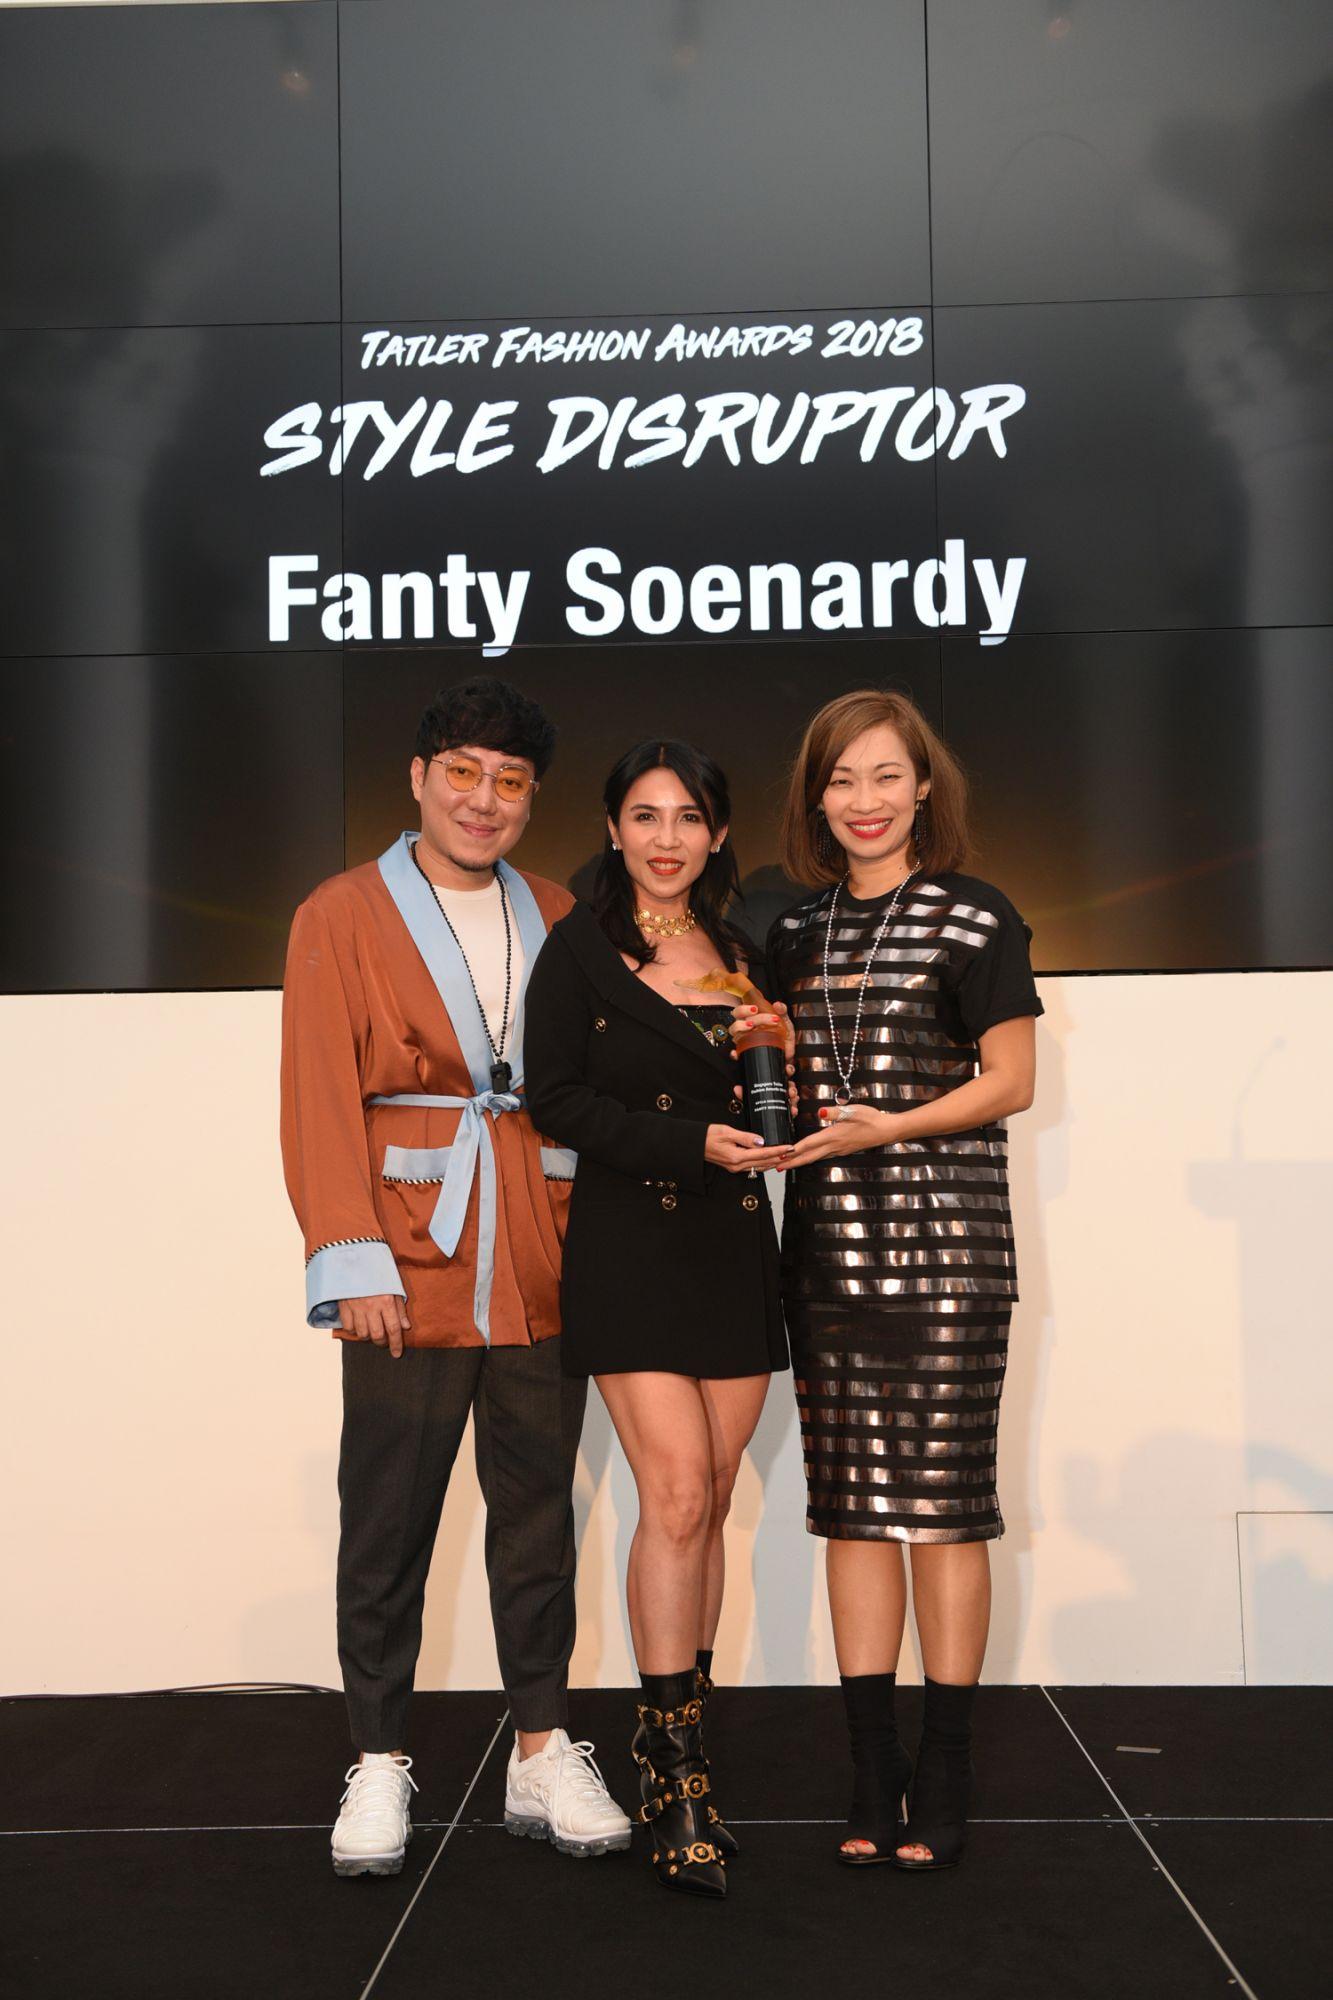 Desmond Lim, Fanty Soenardy, Corinne Ng